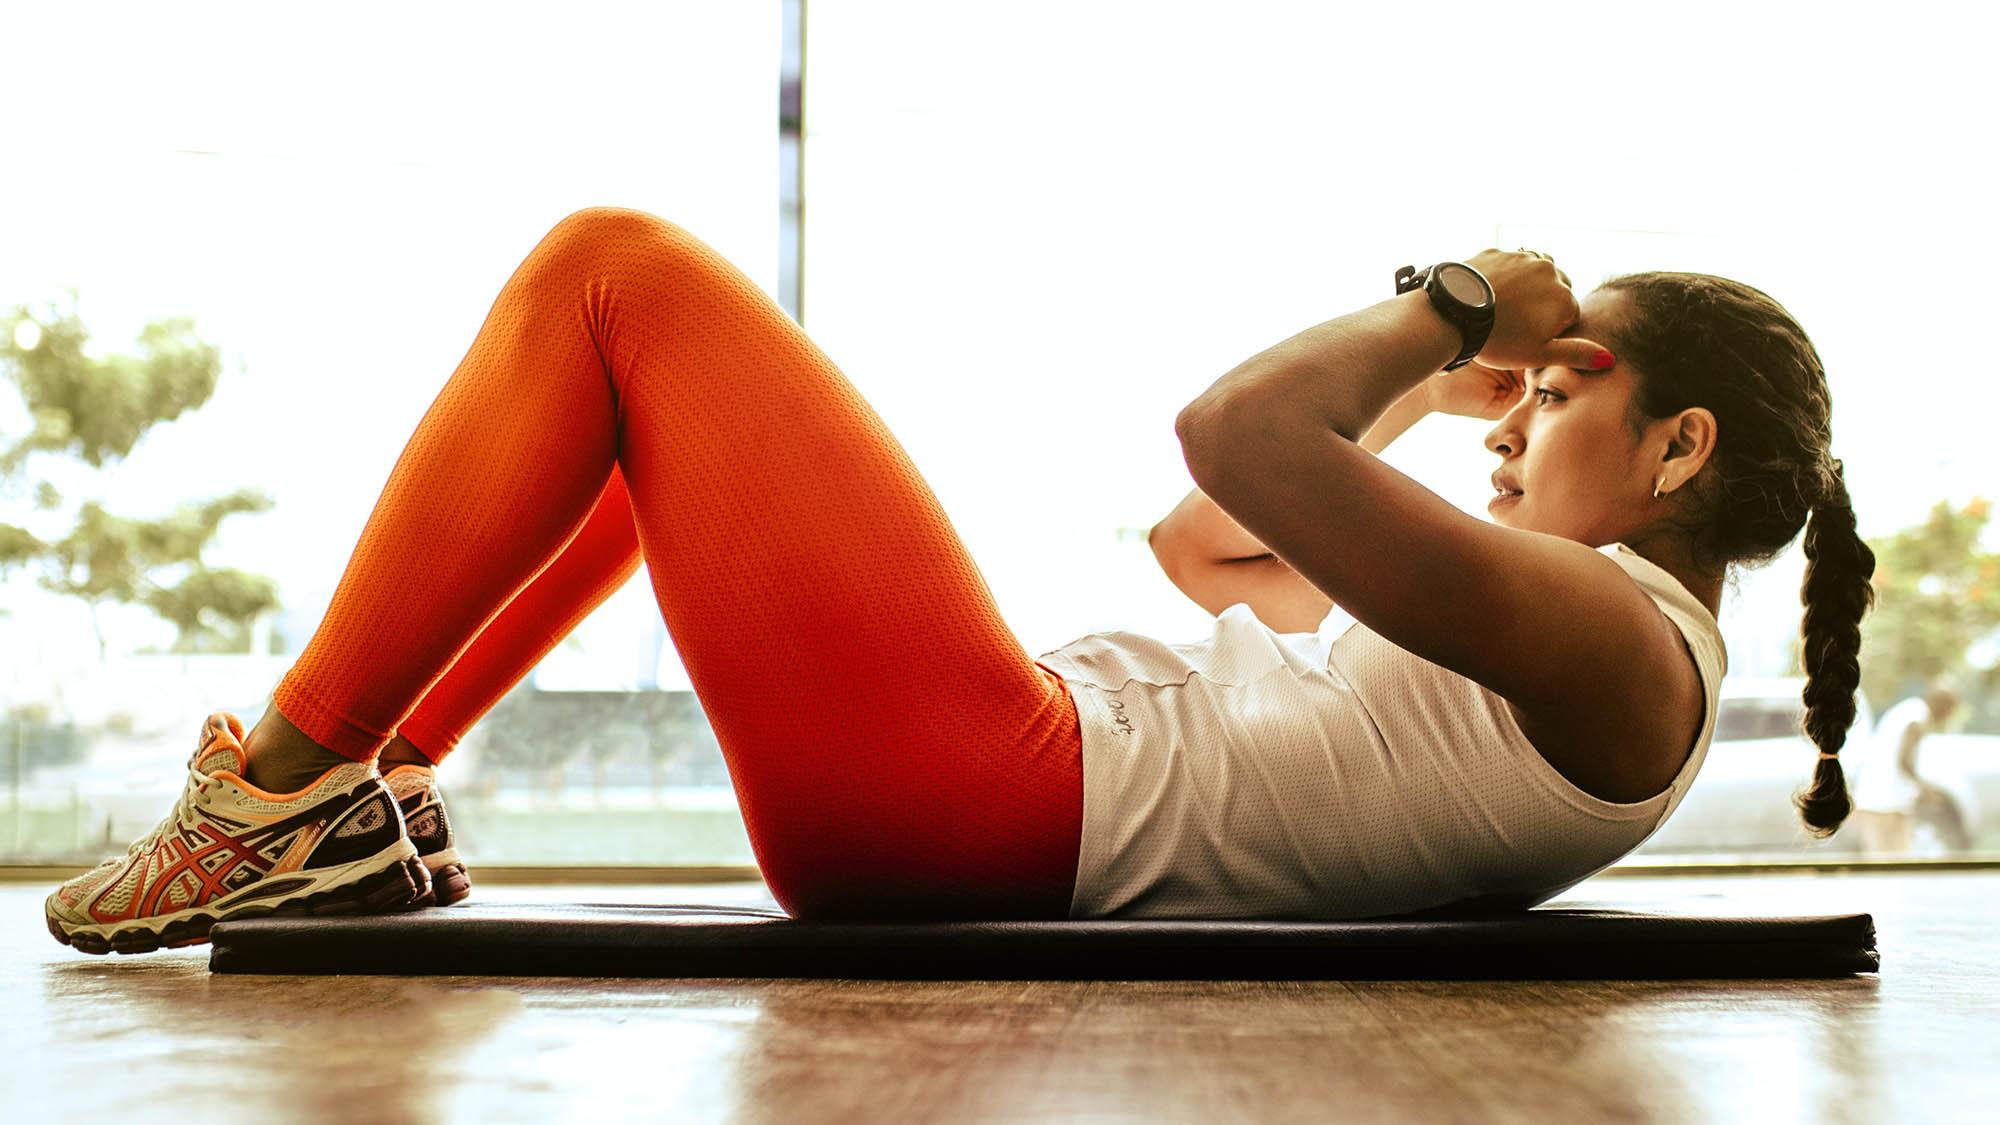 Woman doing crunch on yoga mat